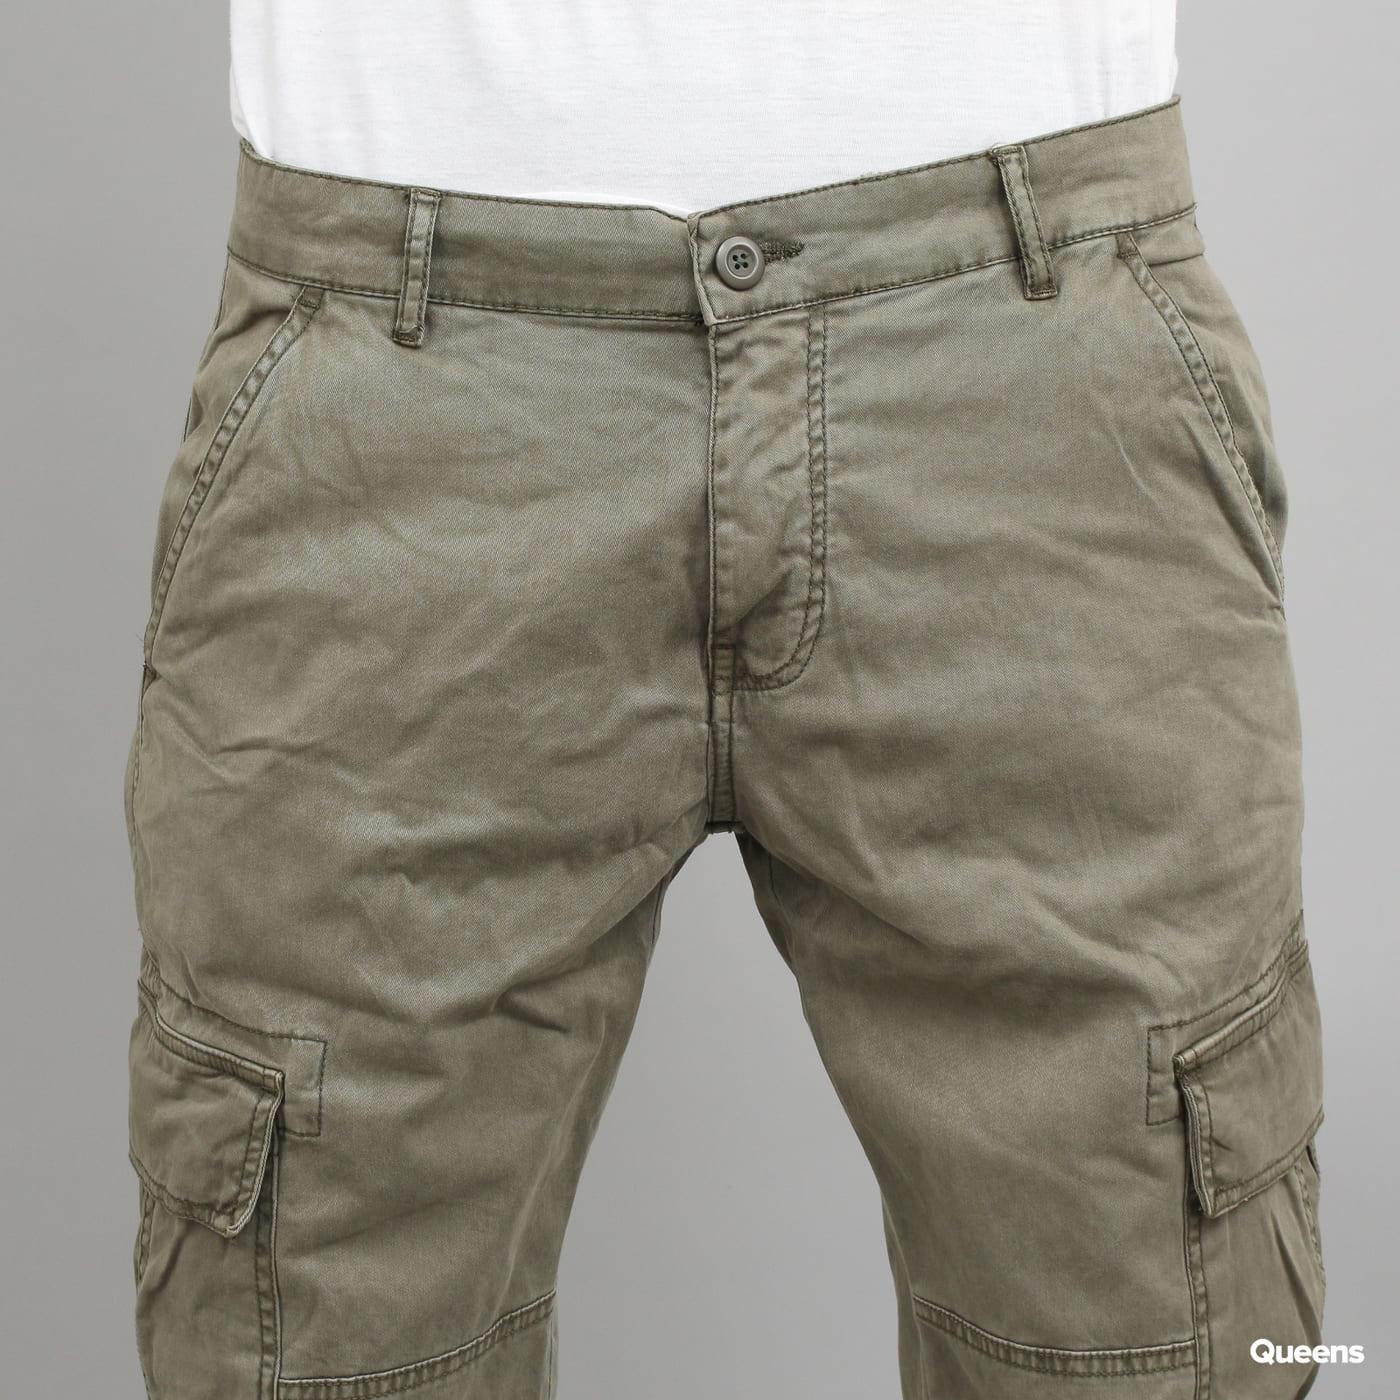 Urban Classics Washed Cargo Twill Jogging Pants olivové